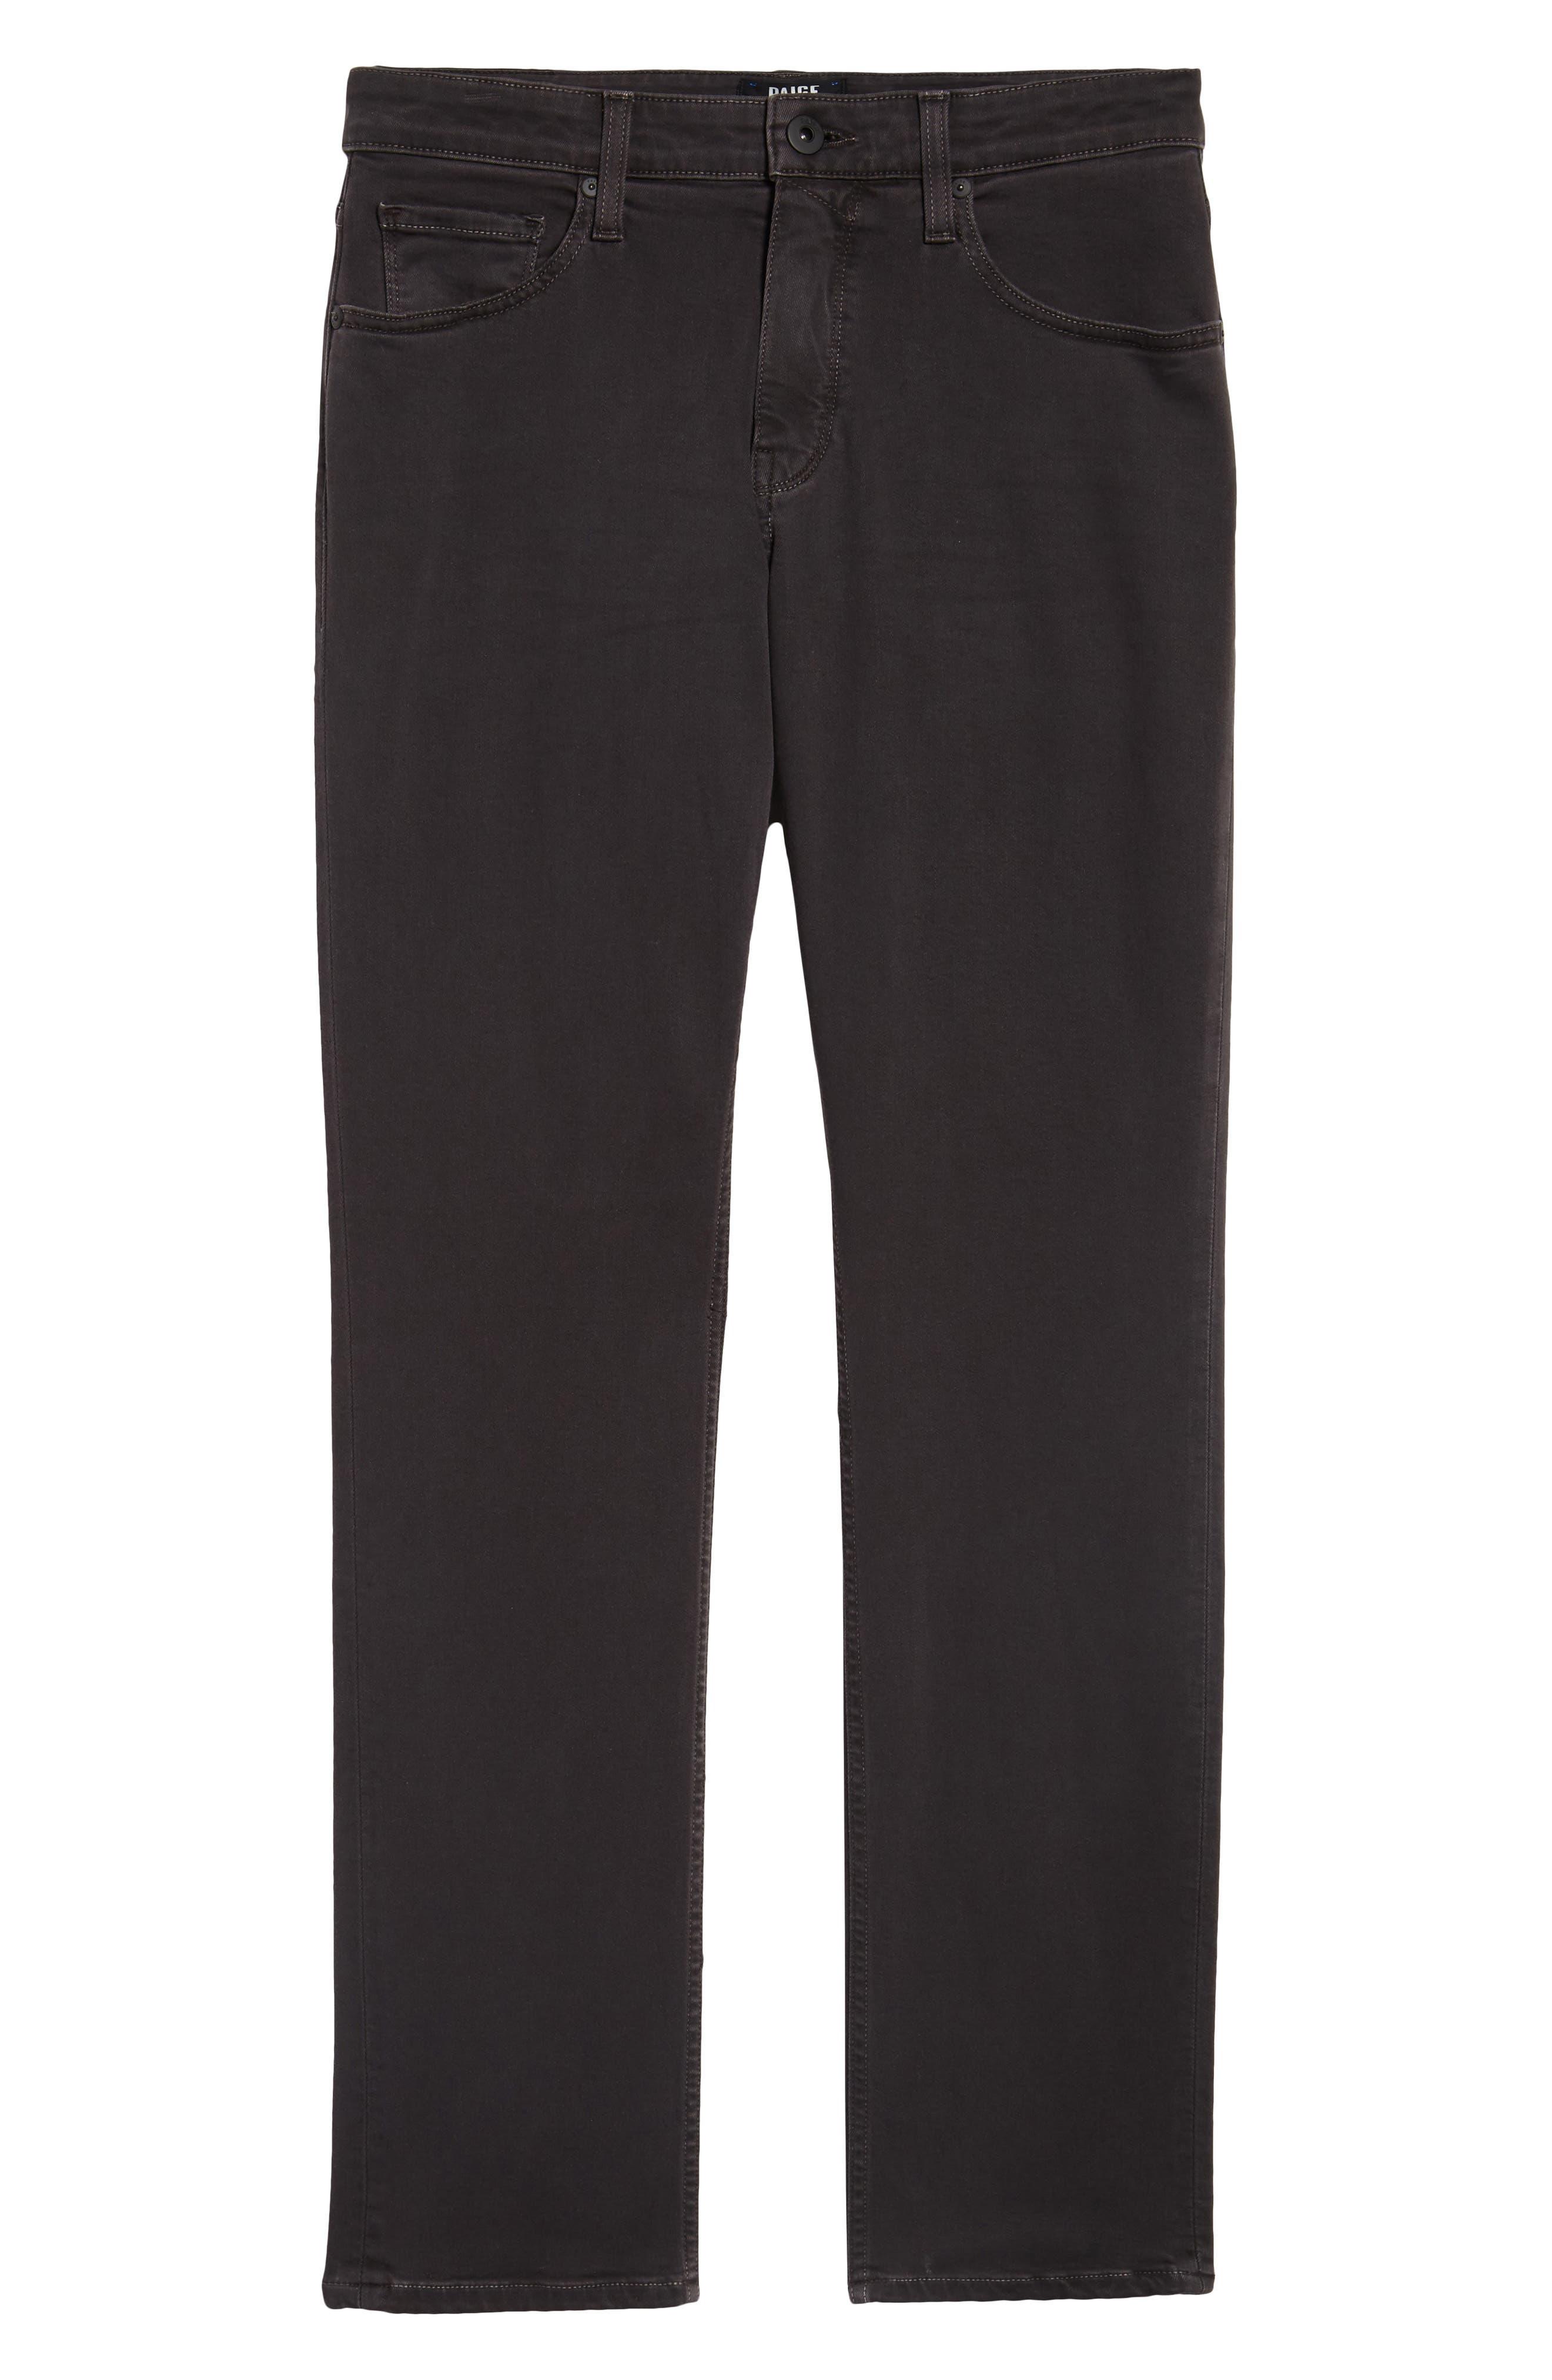 Transcend - Federal Slim Straight Leg Jeans,                             Alternate thumbnail 6, color,                             001